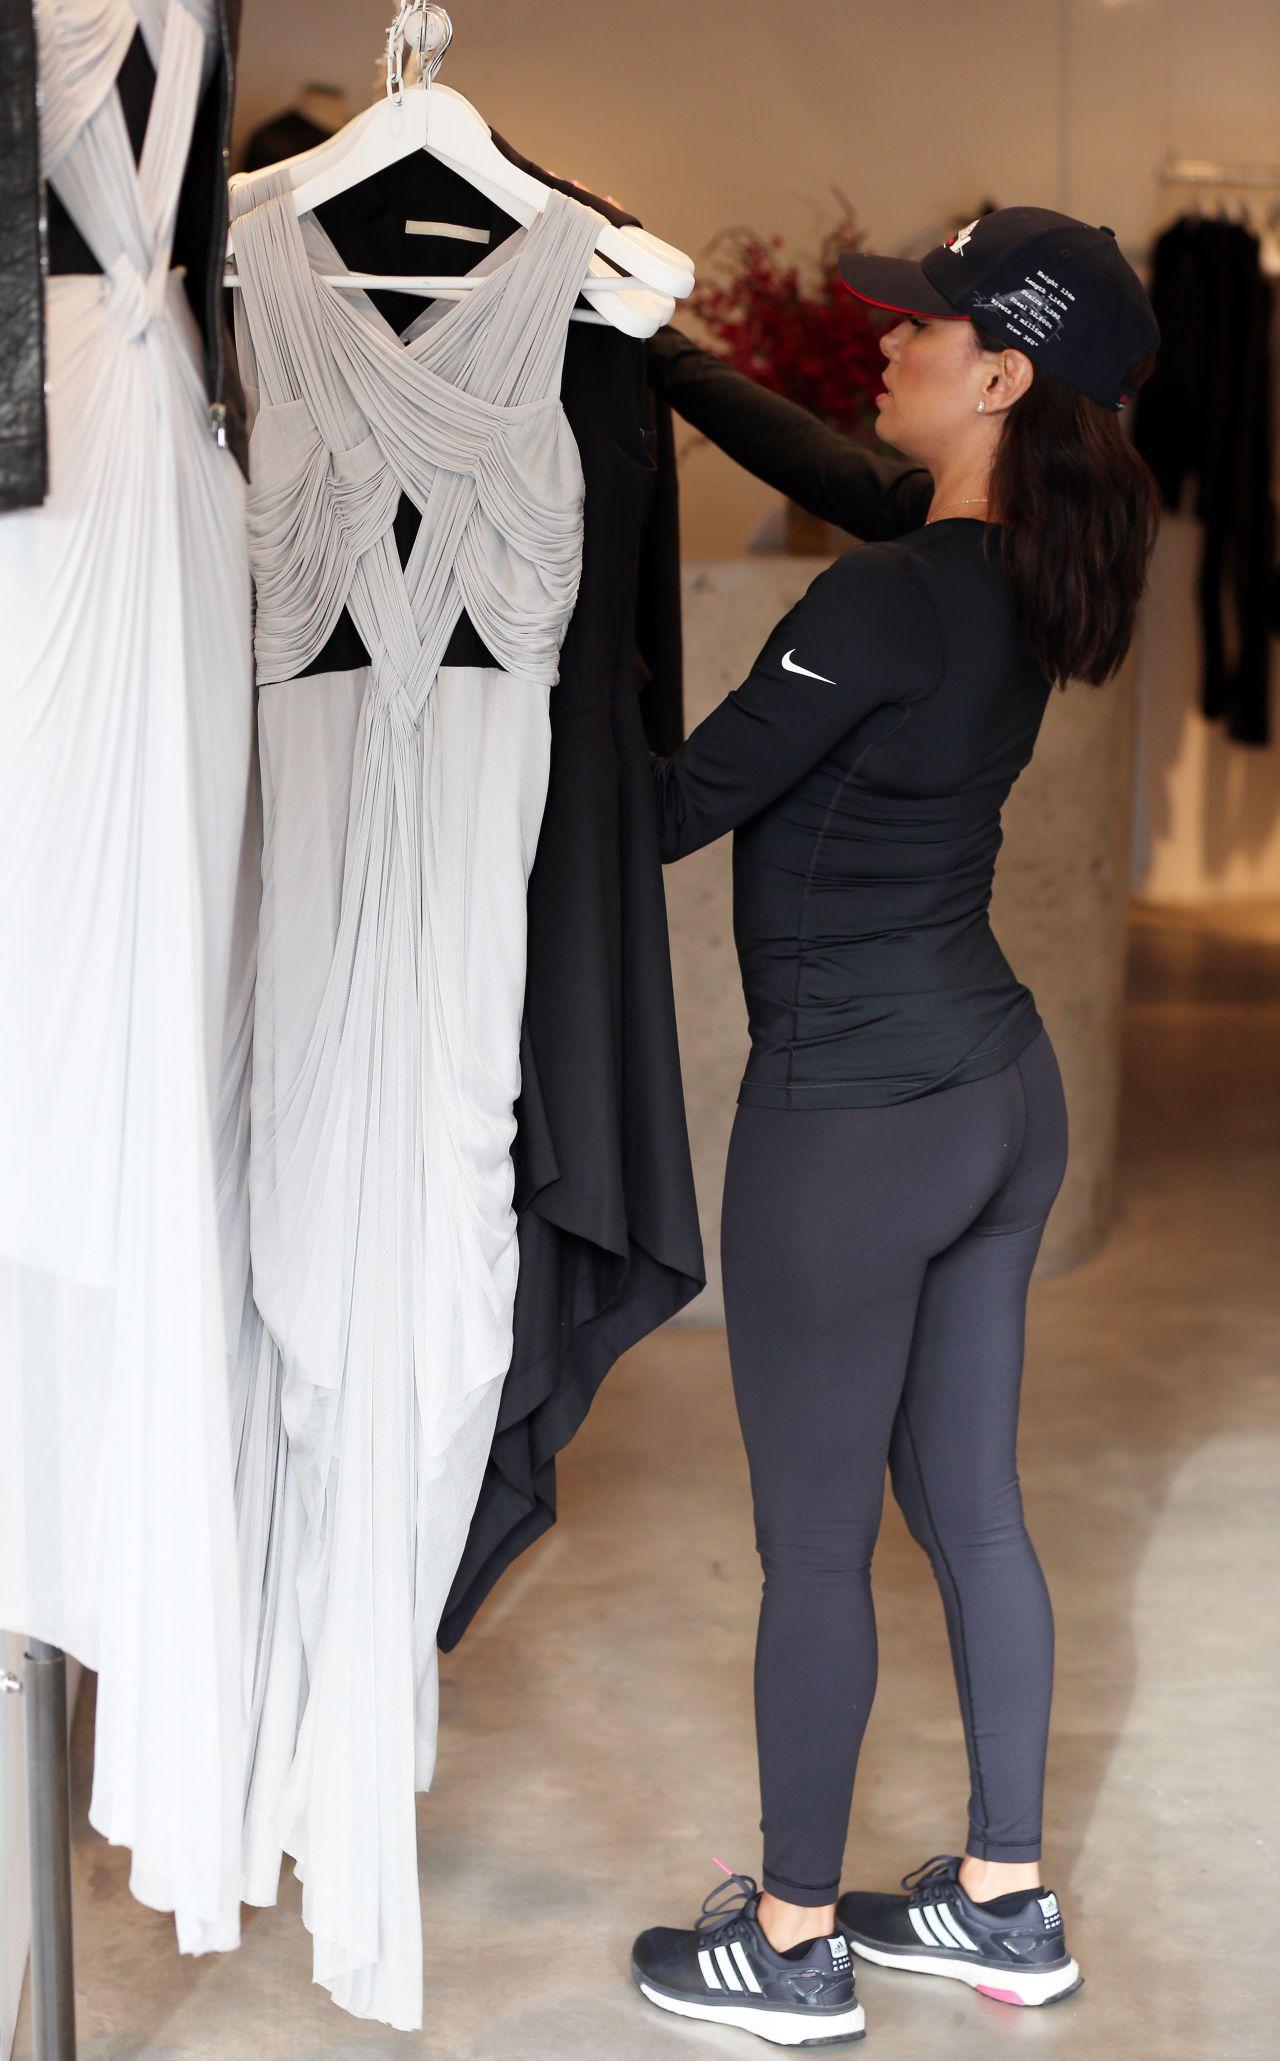 Eva Longoria Booty In Tights Sydney July 2015